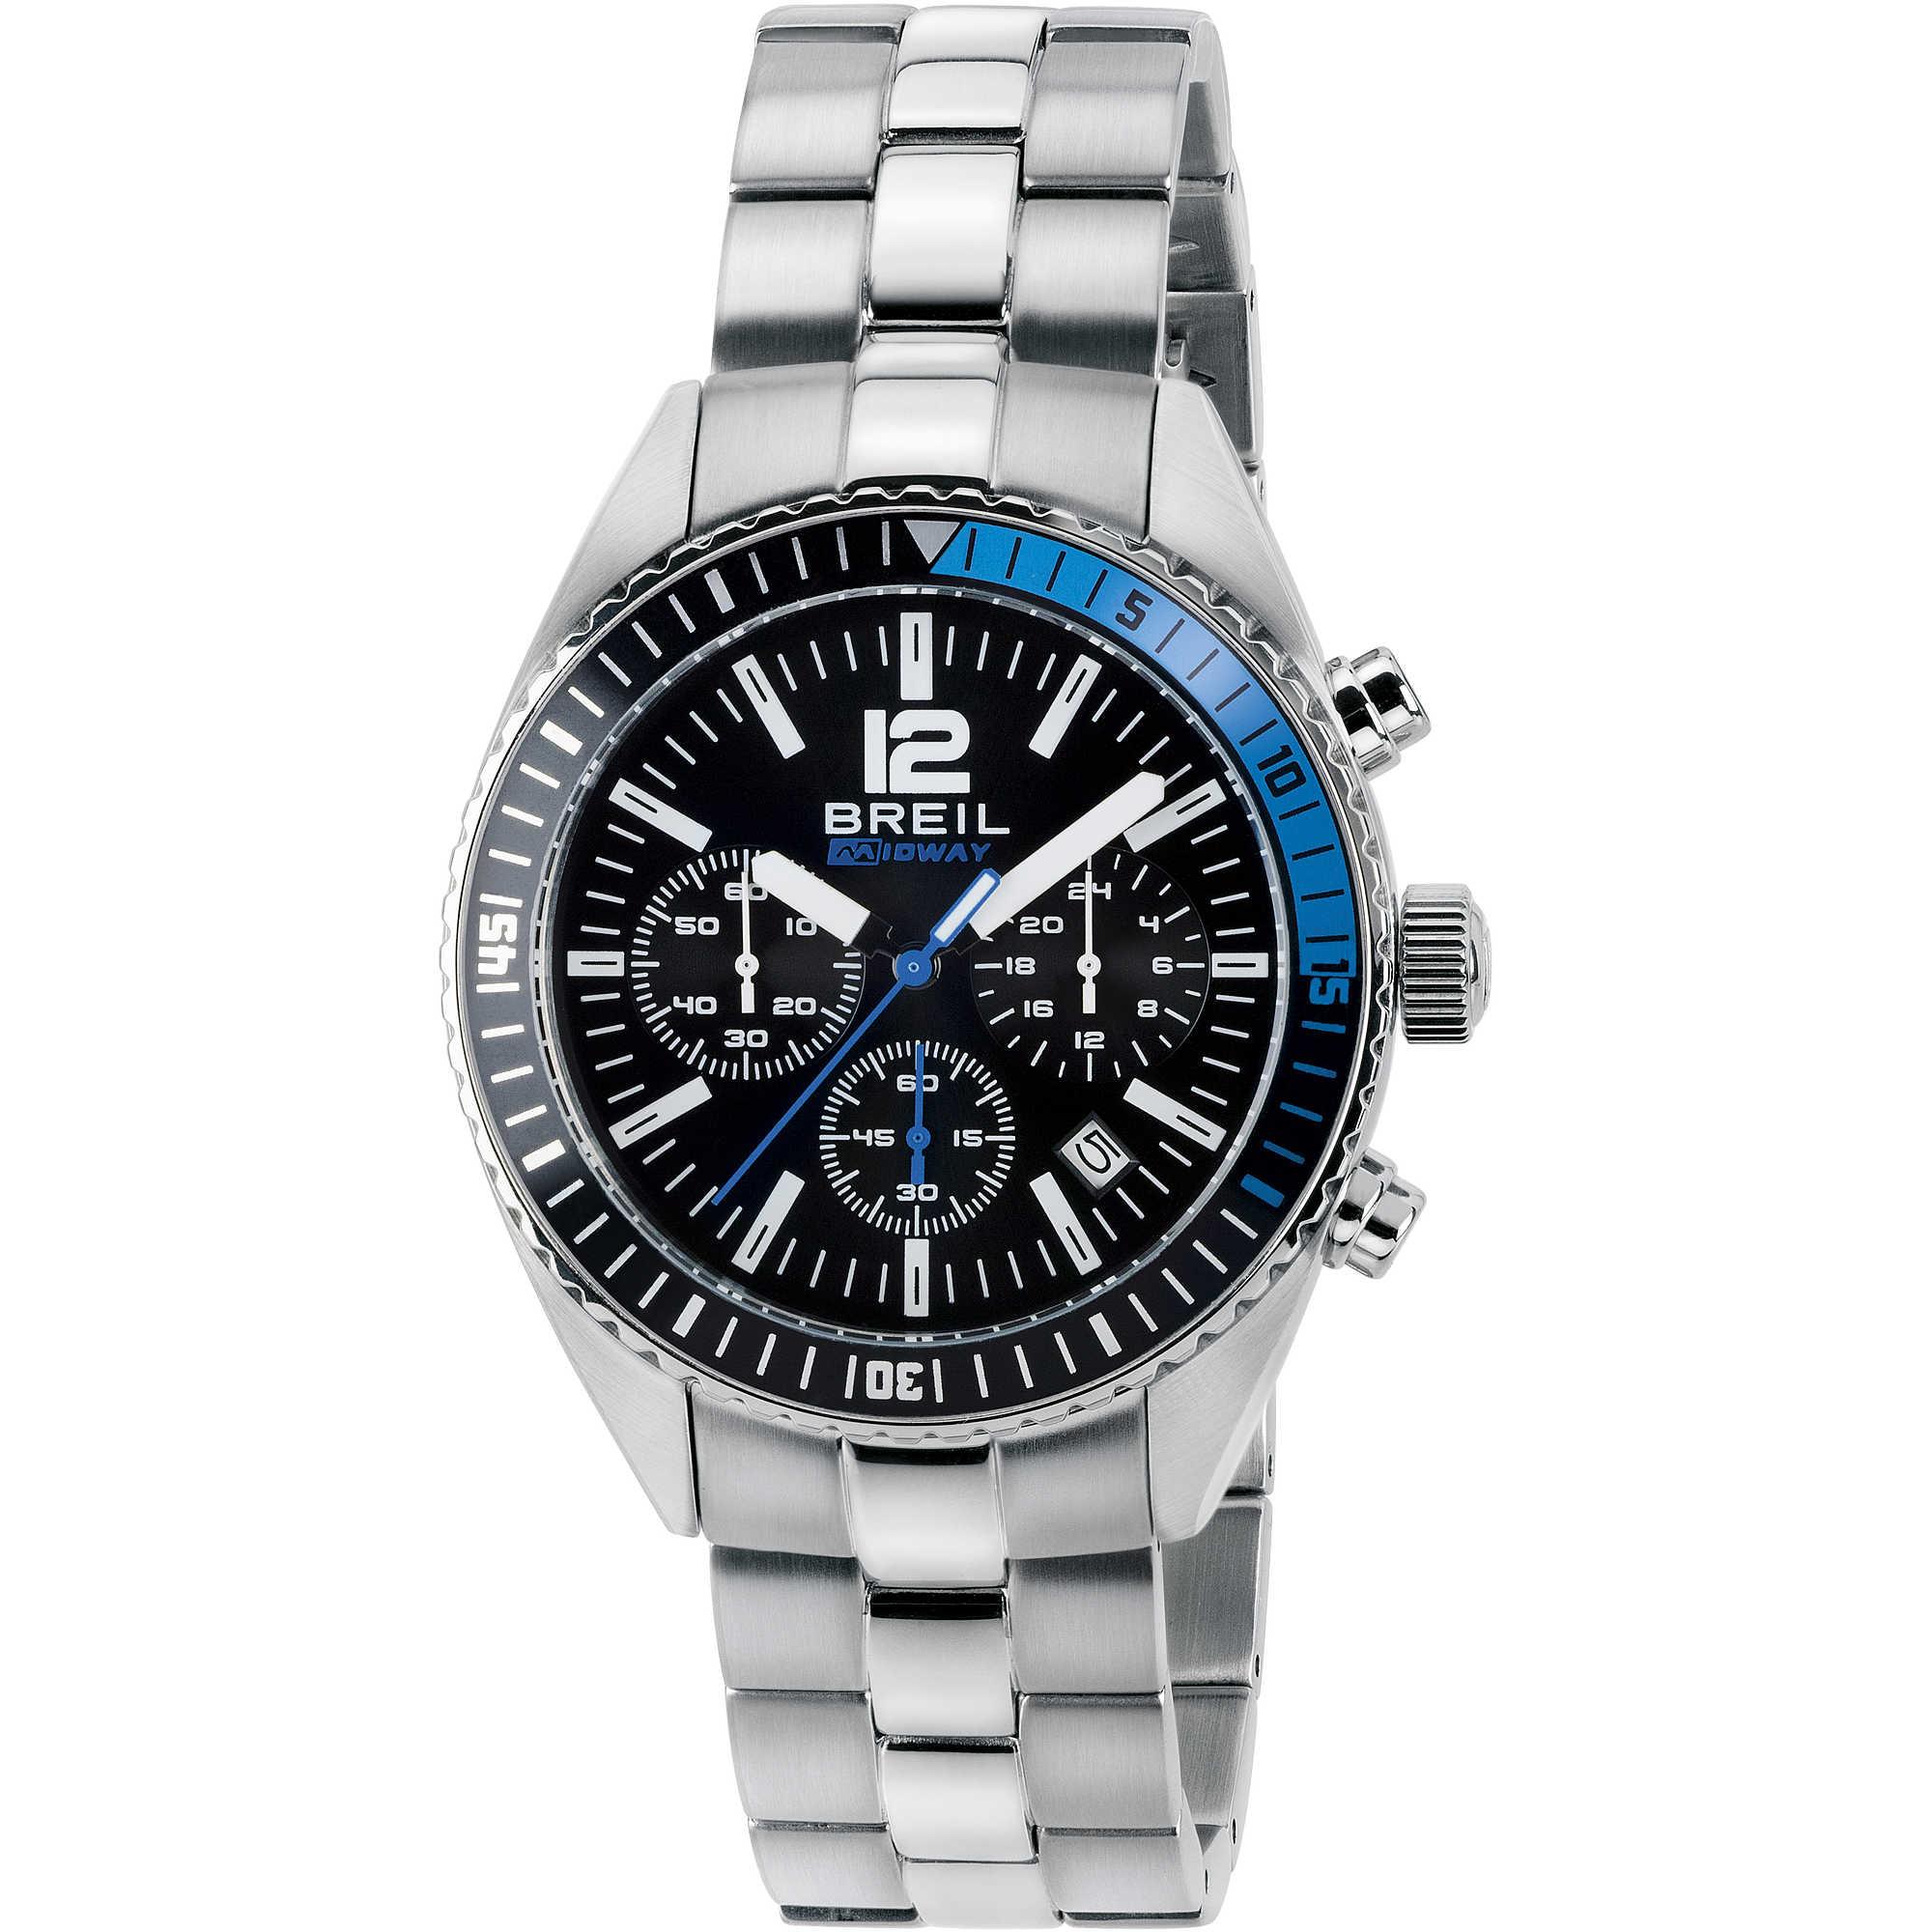 più recente 32990 5ff5a orologio cronografo uomo Breil Midway TW1633